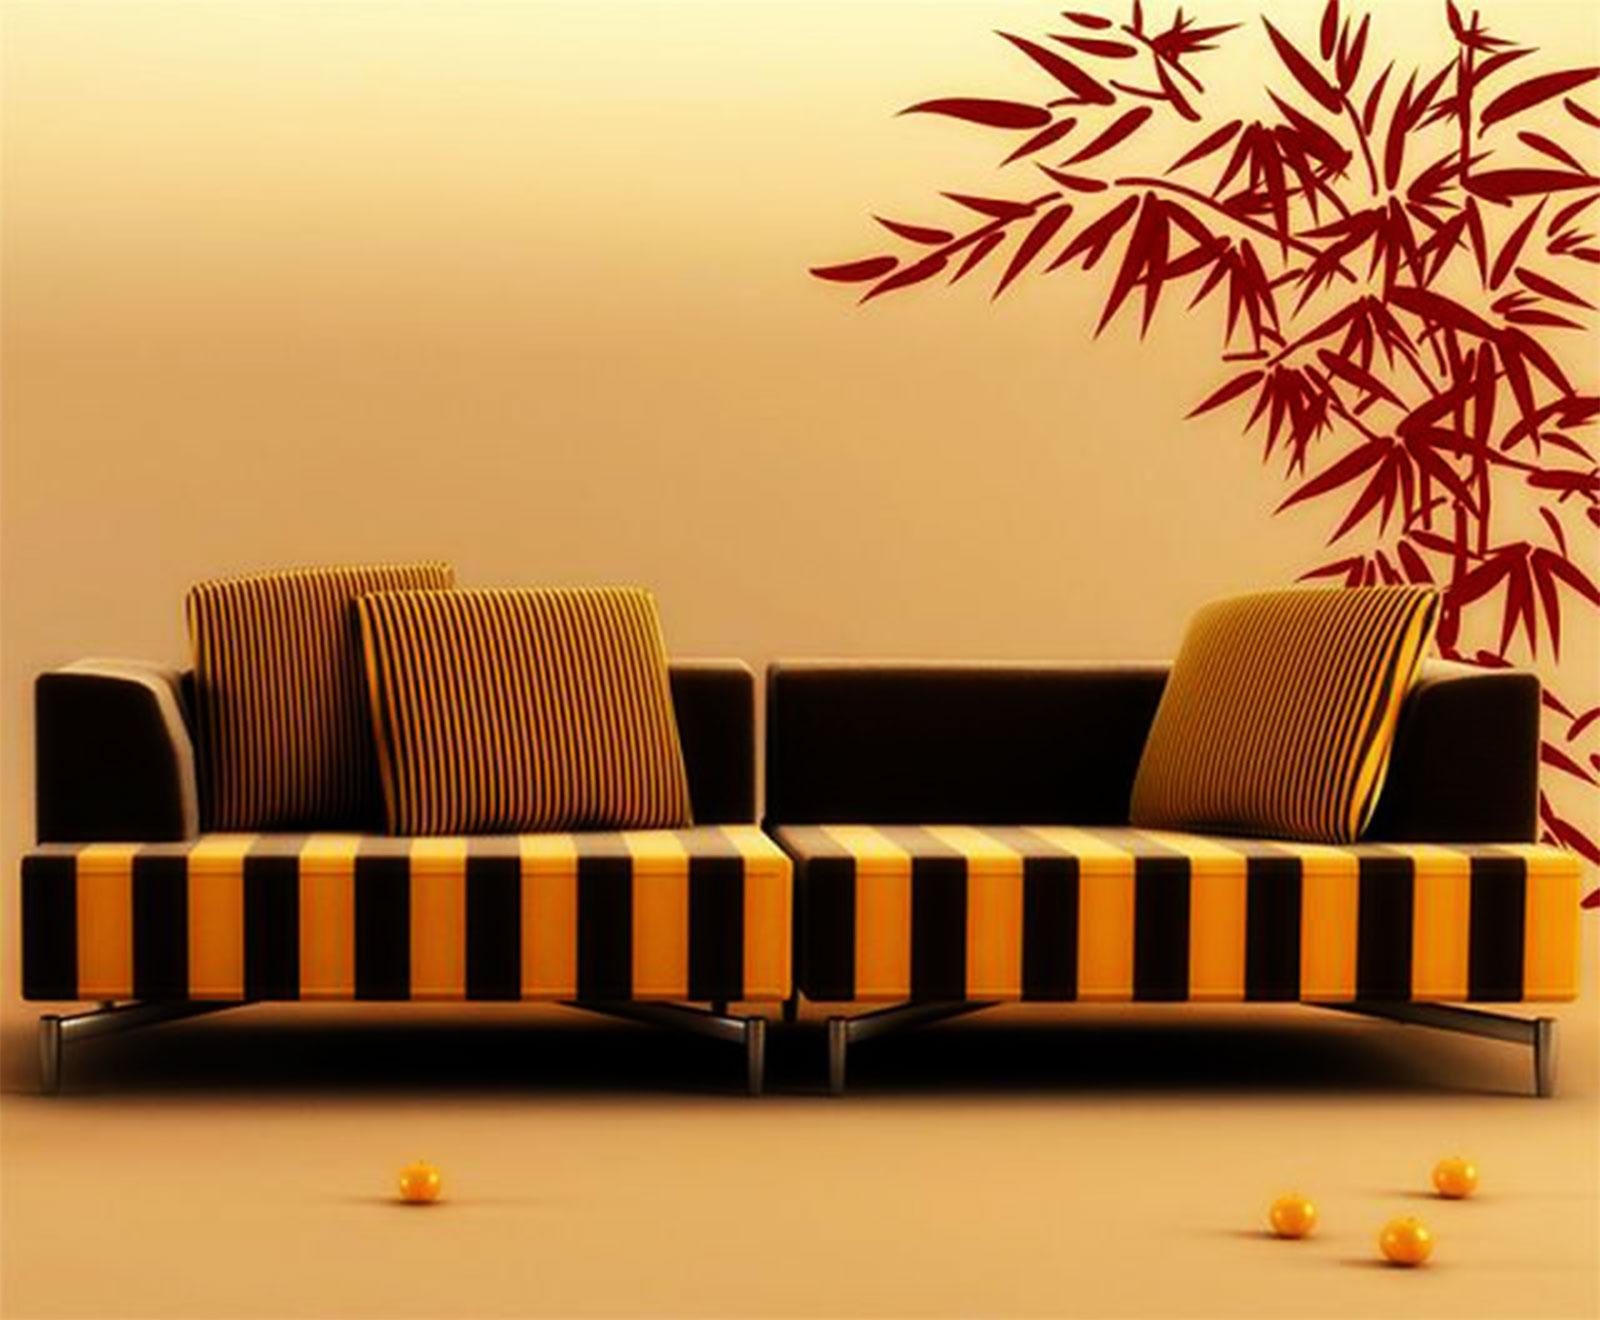 Wall Decals Bamboo - Elitflat